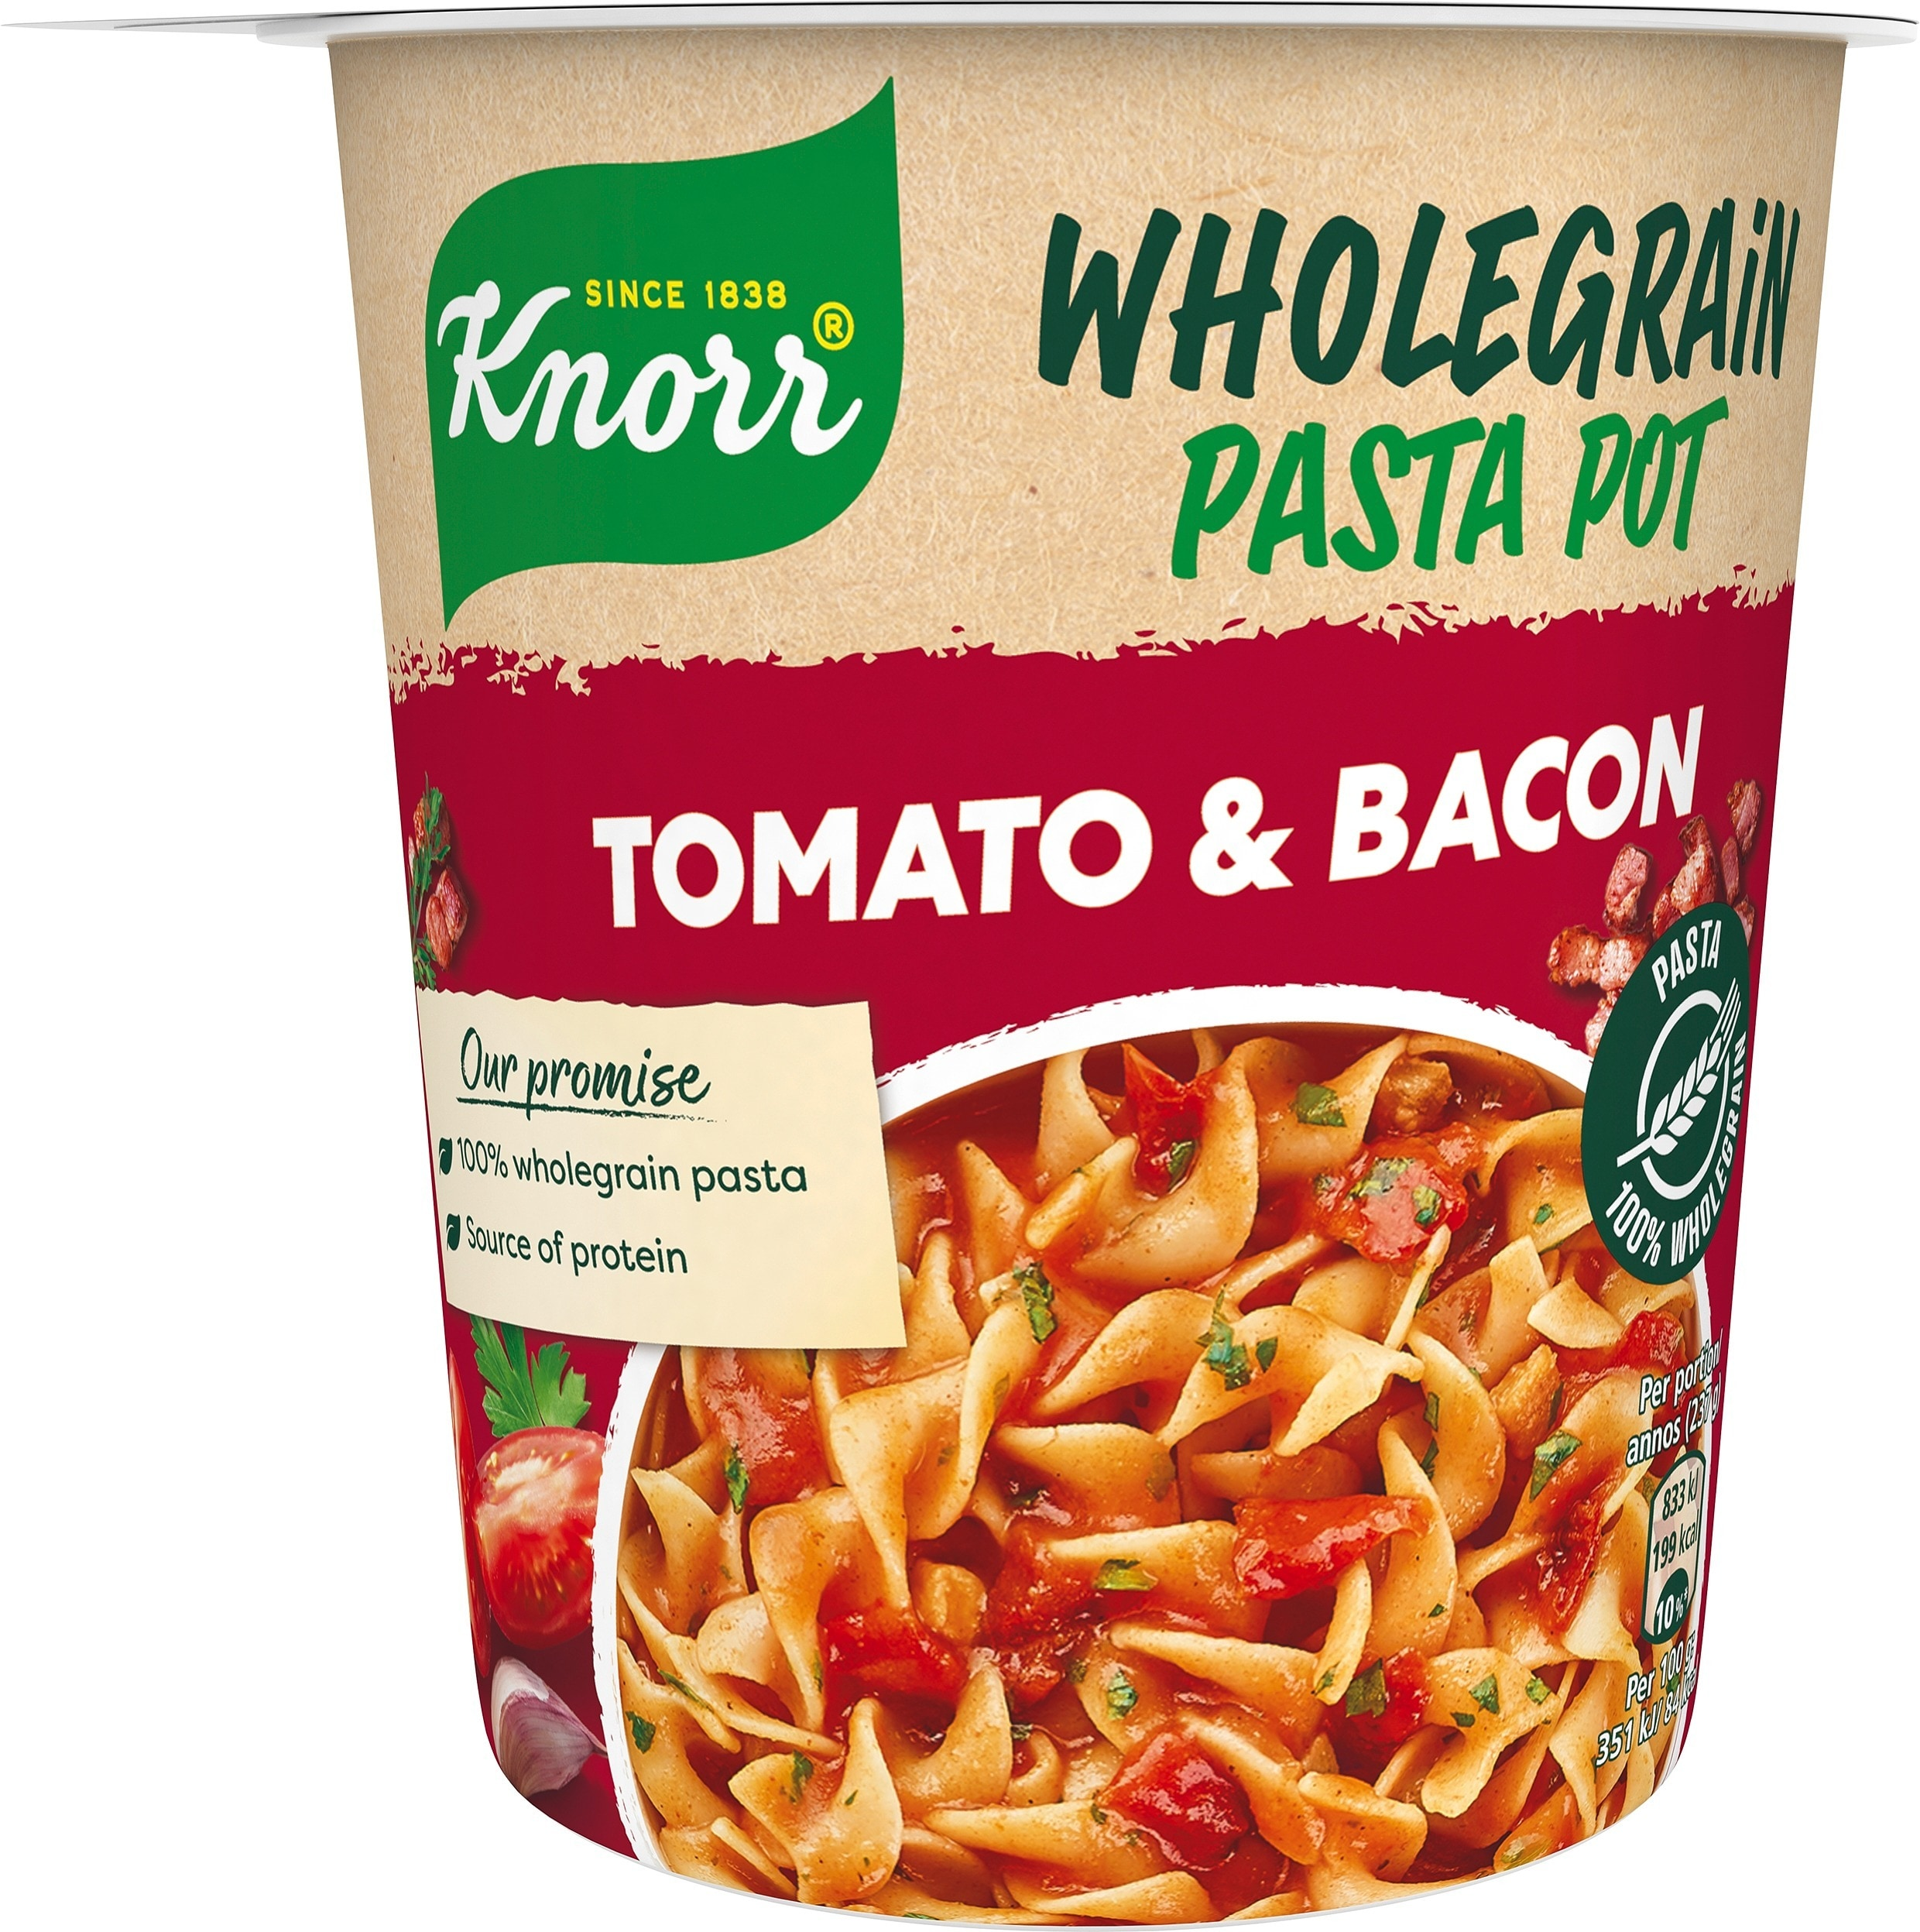 Snack Pot Fullkorn, Tomato & Bacon, 8 x 57 g -